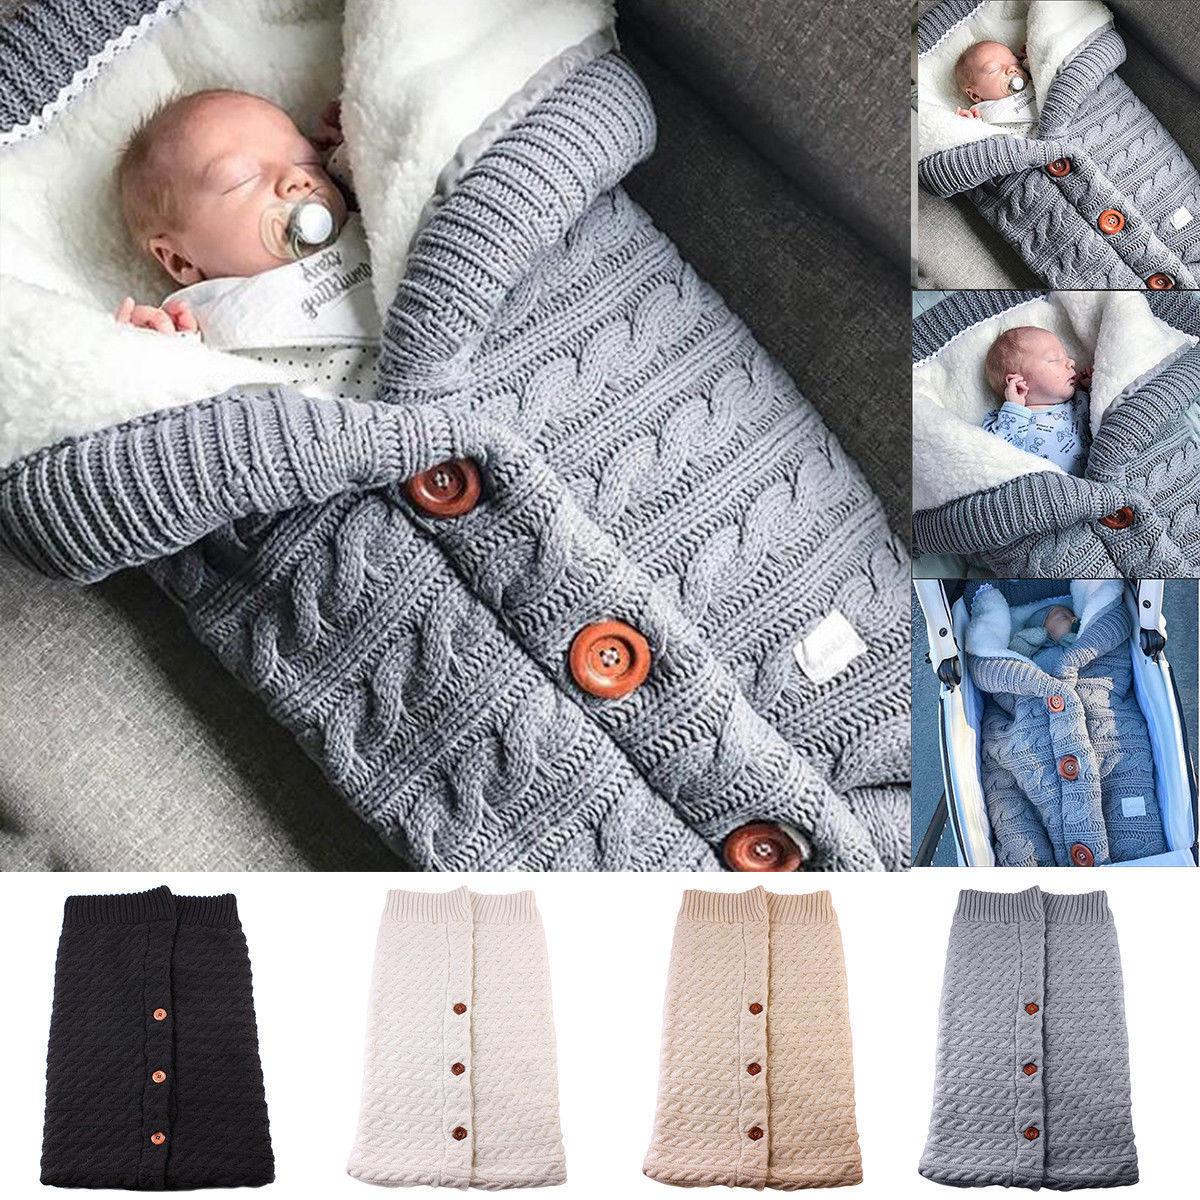 Newborn Baby Winter Warm Sleeping Bags Infant Button Knit Swaddle Wrap Swaddling Stroller Wrap Toddler Blanket Sleeping Bags 1